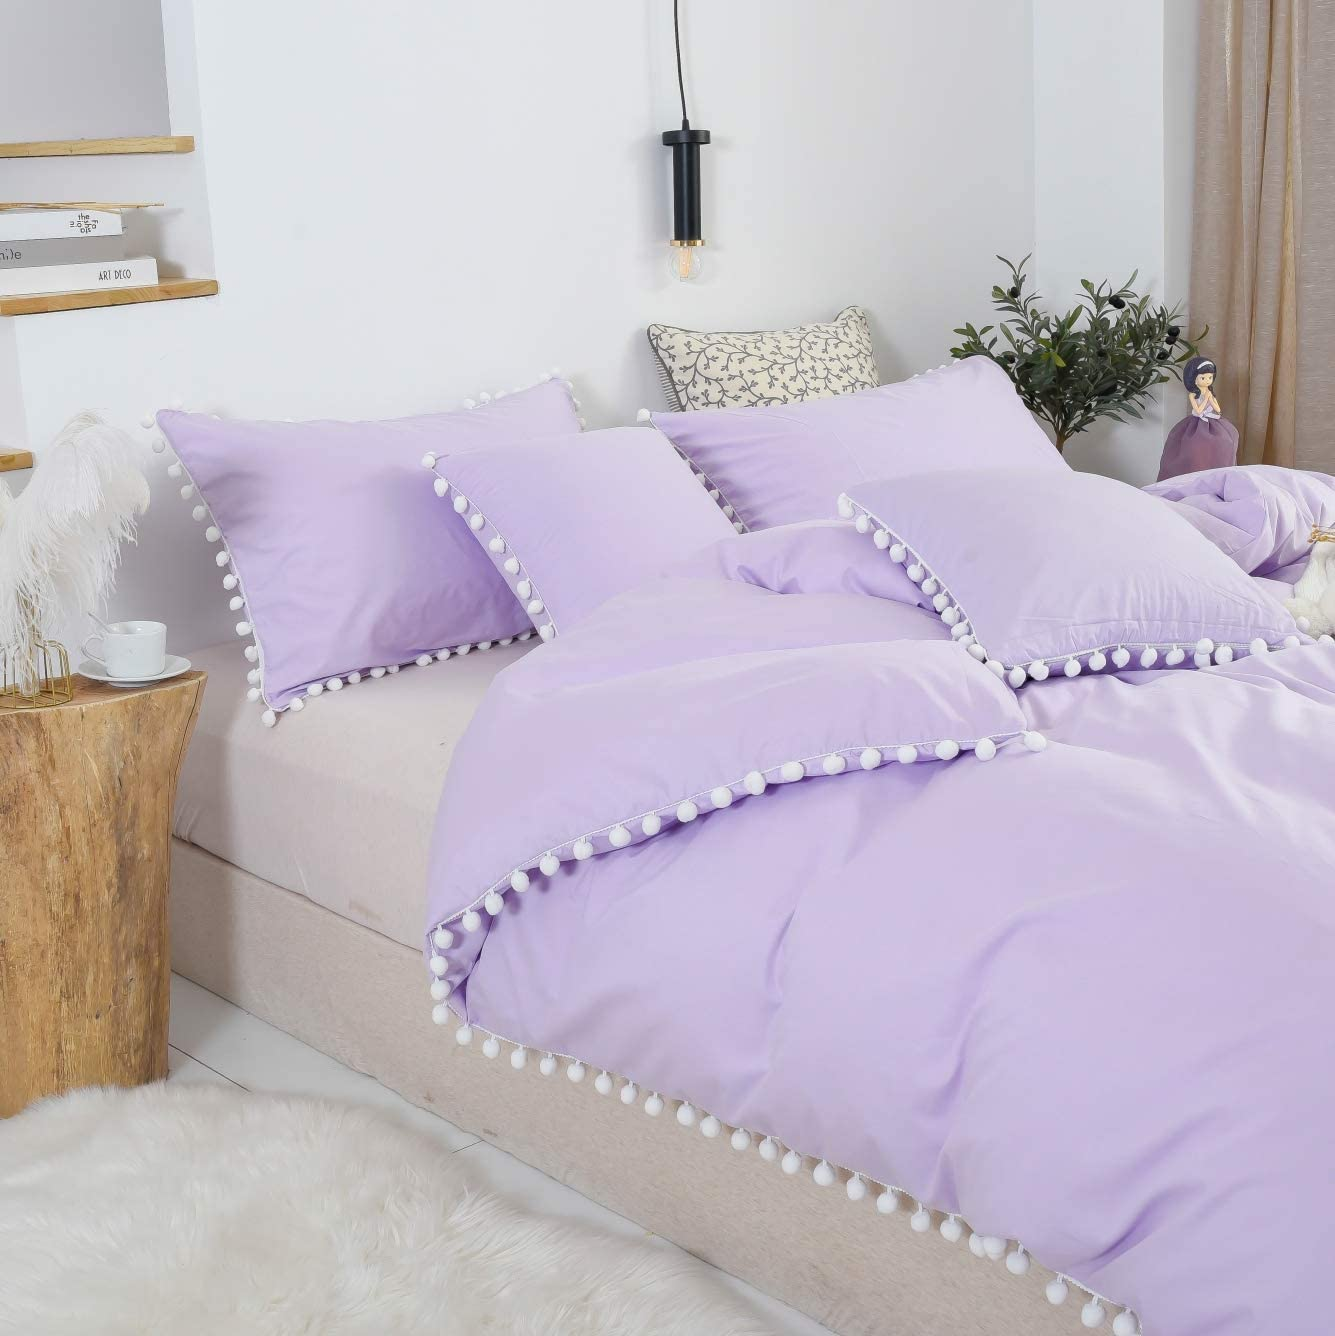 Softta Boho Bedding Tassel Duvet Cover Fringed Twin 3 Pcs 100/% Washed Cotton Vintage and Elegant Ruffle Duvet Covers White